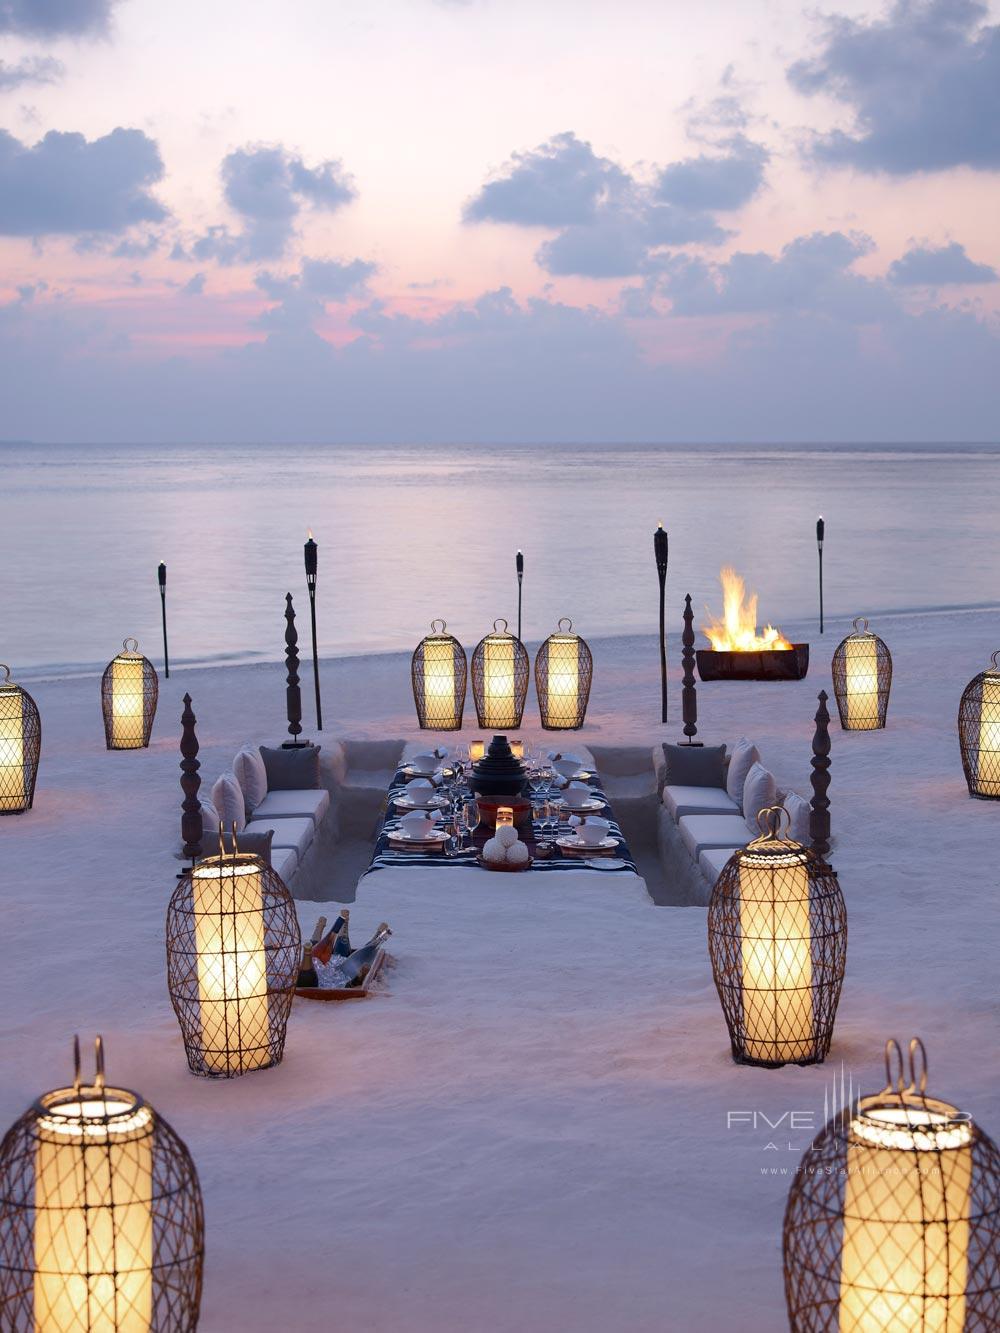 Border less Romantic Private Beach Dining at Dusit Thani Maldives